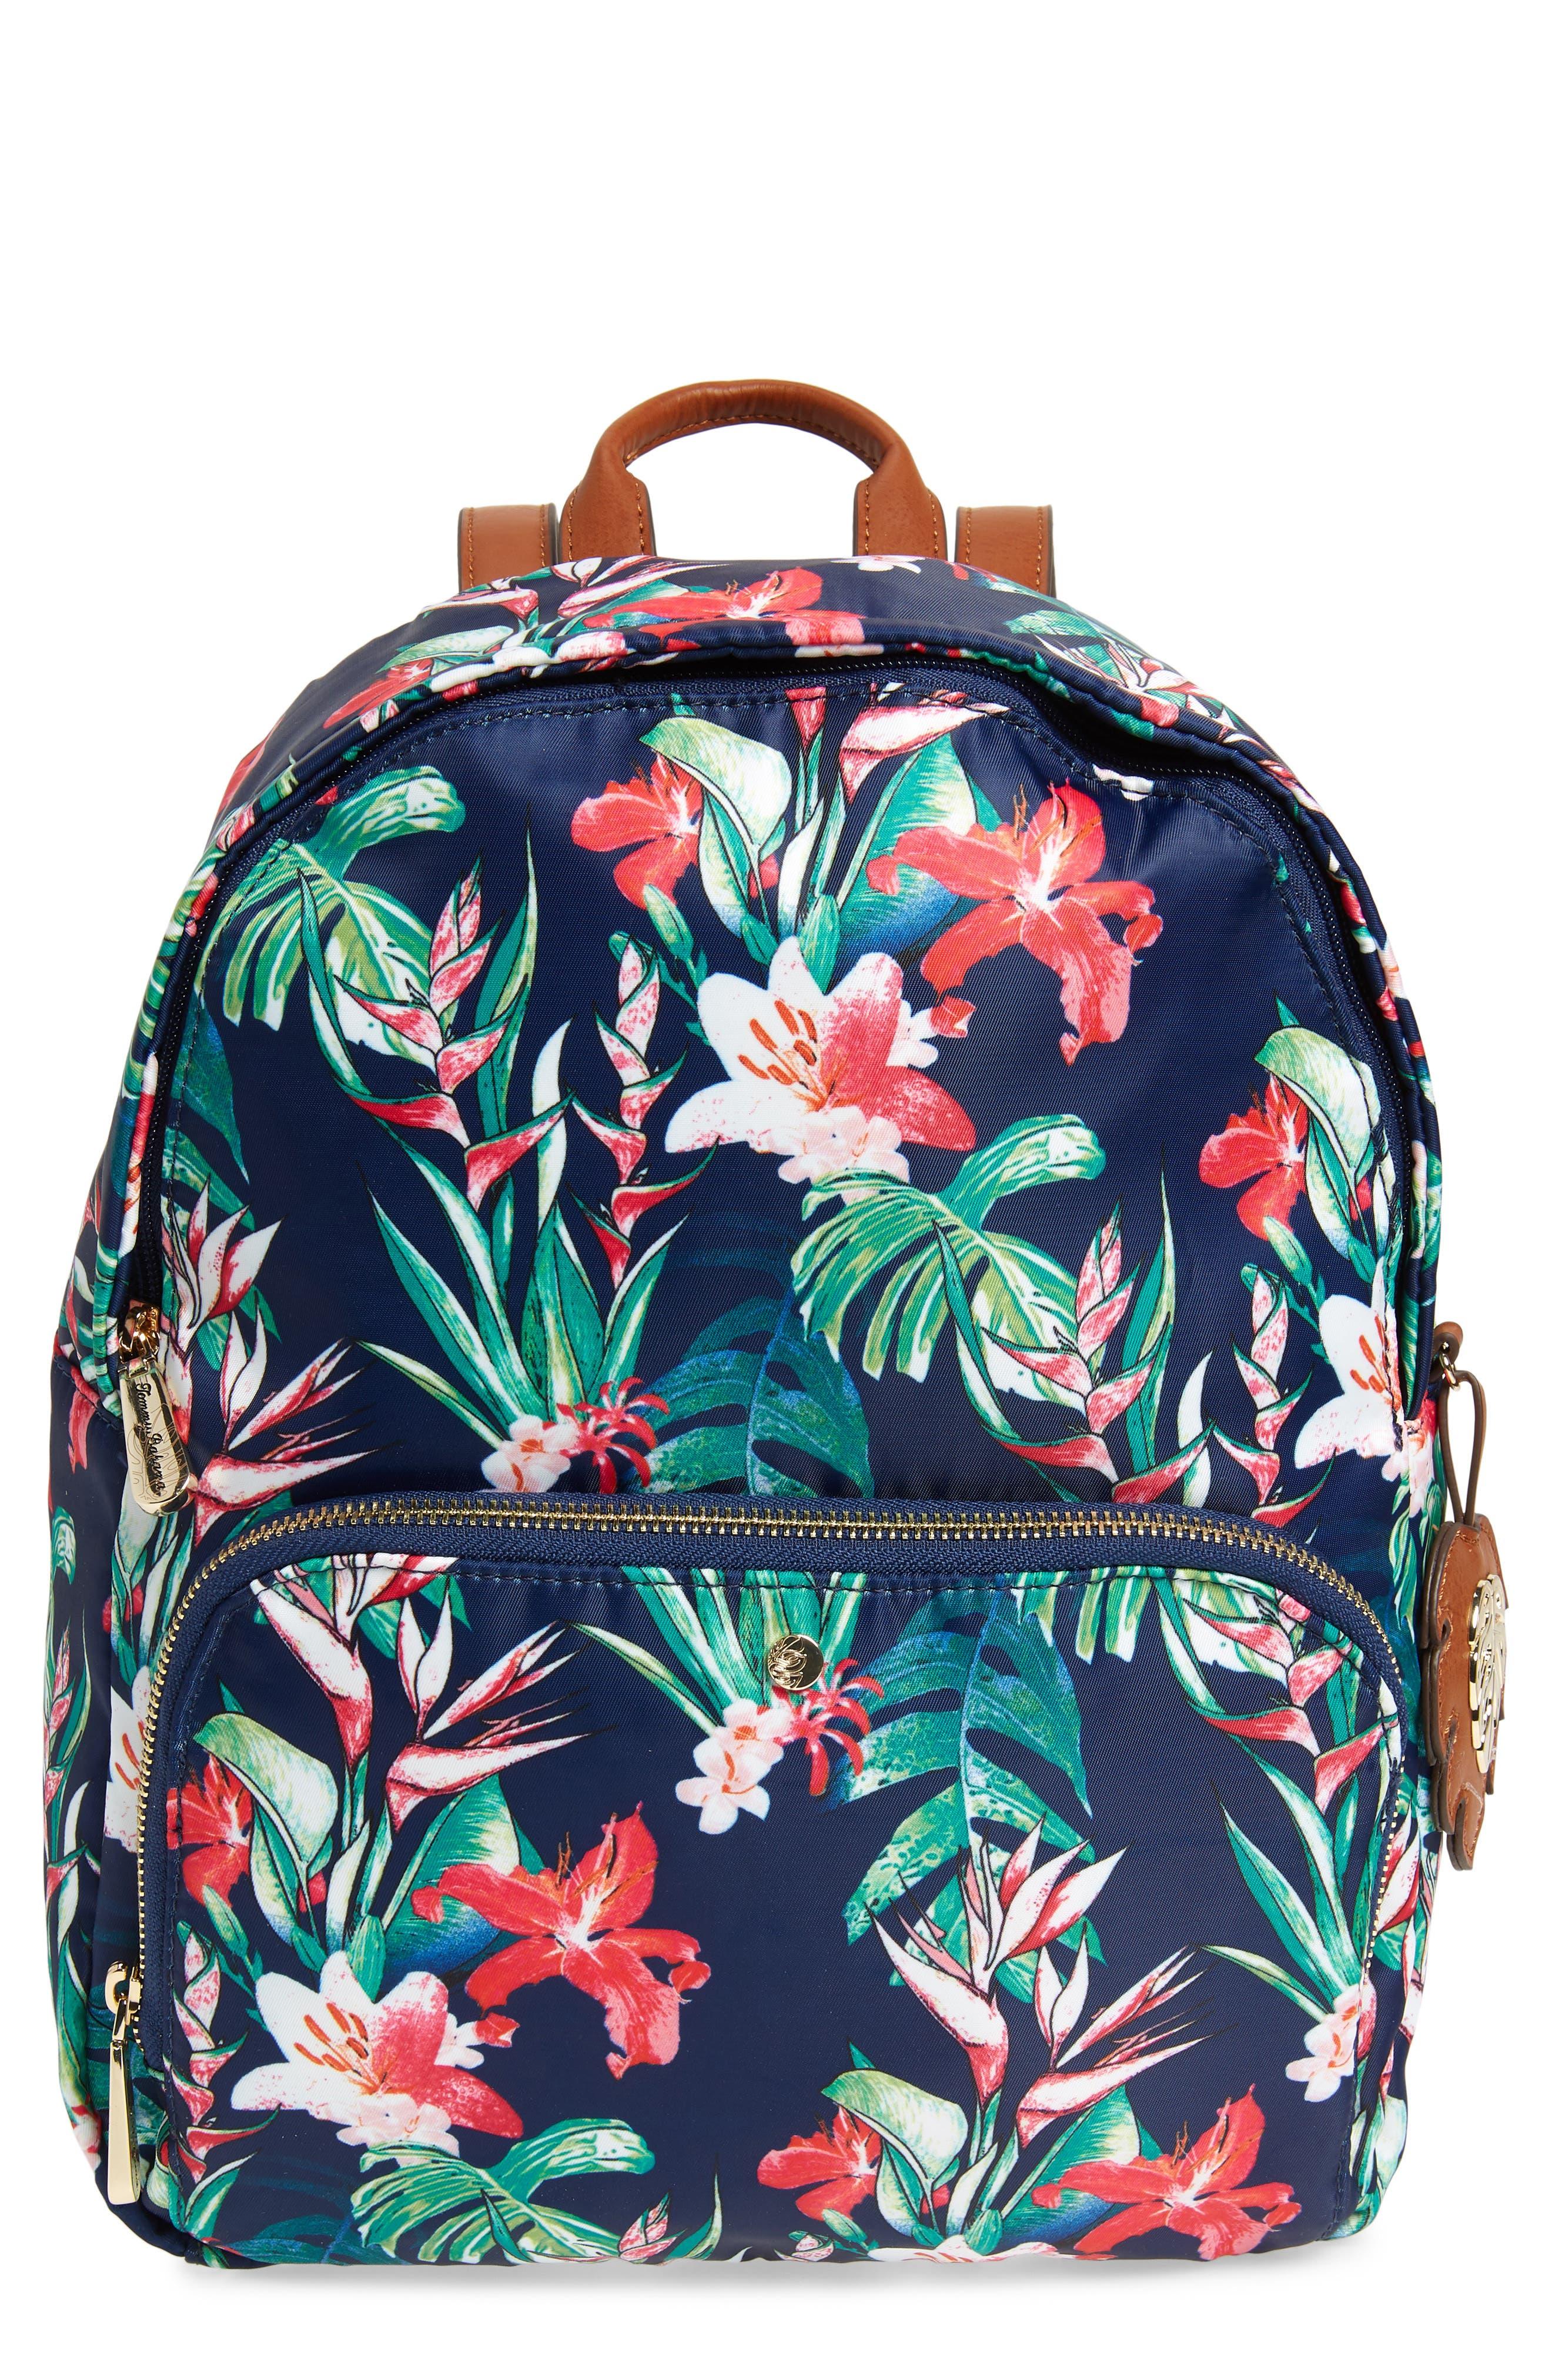 Siesta Key Backpack,                             Main thumbnail 1, color,                             Tropical Lily